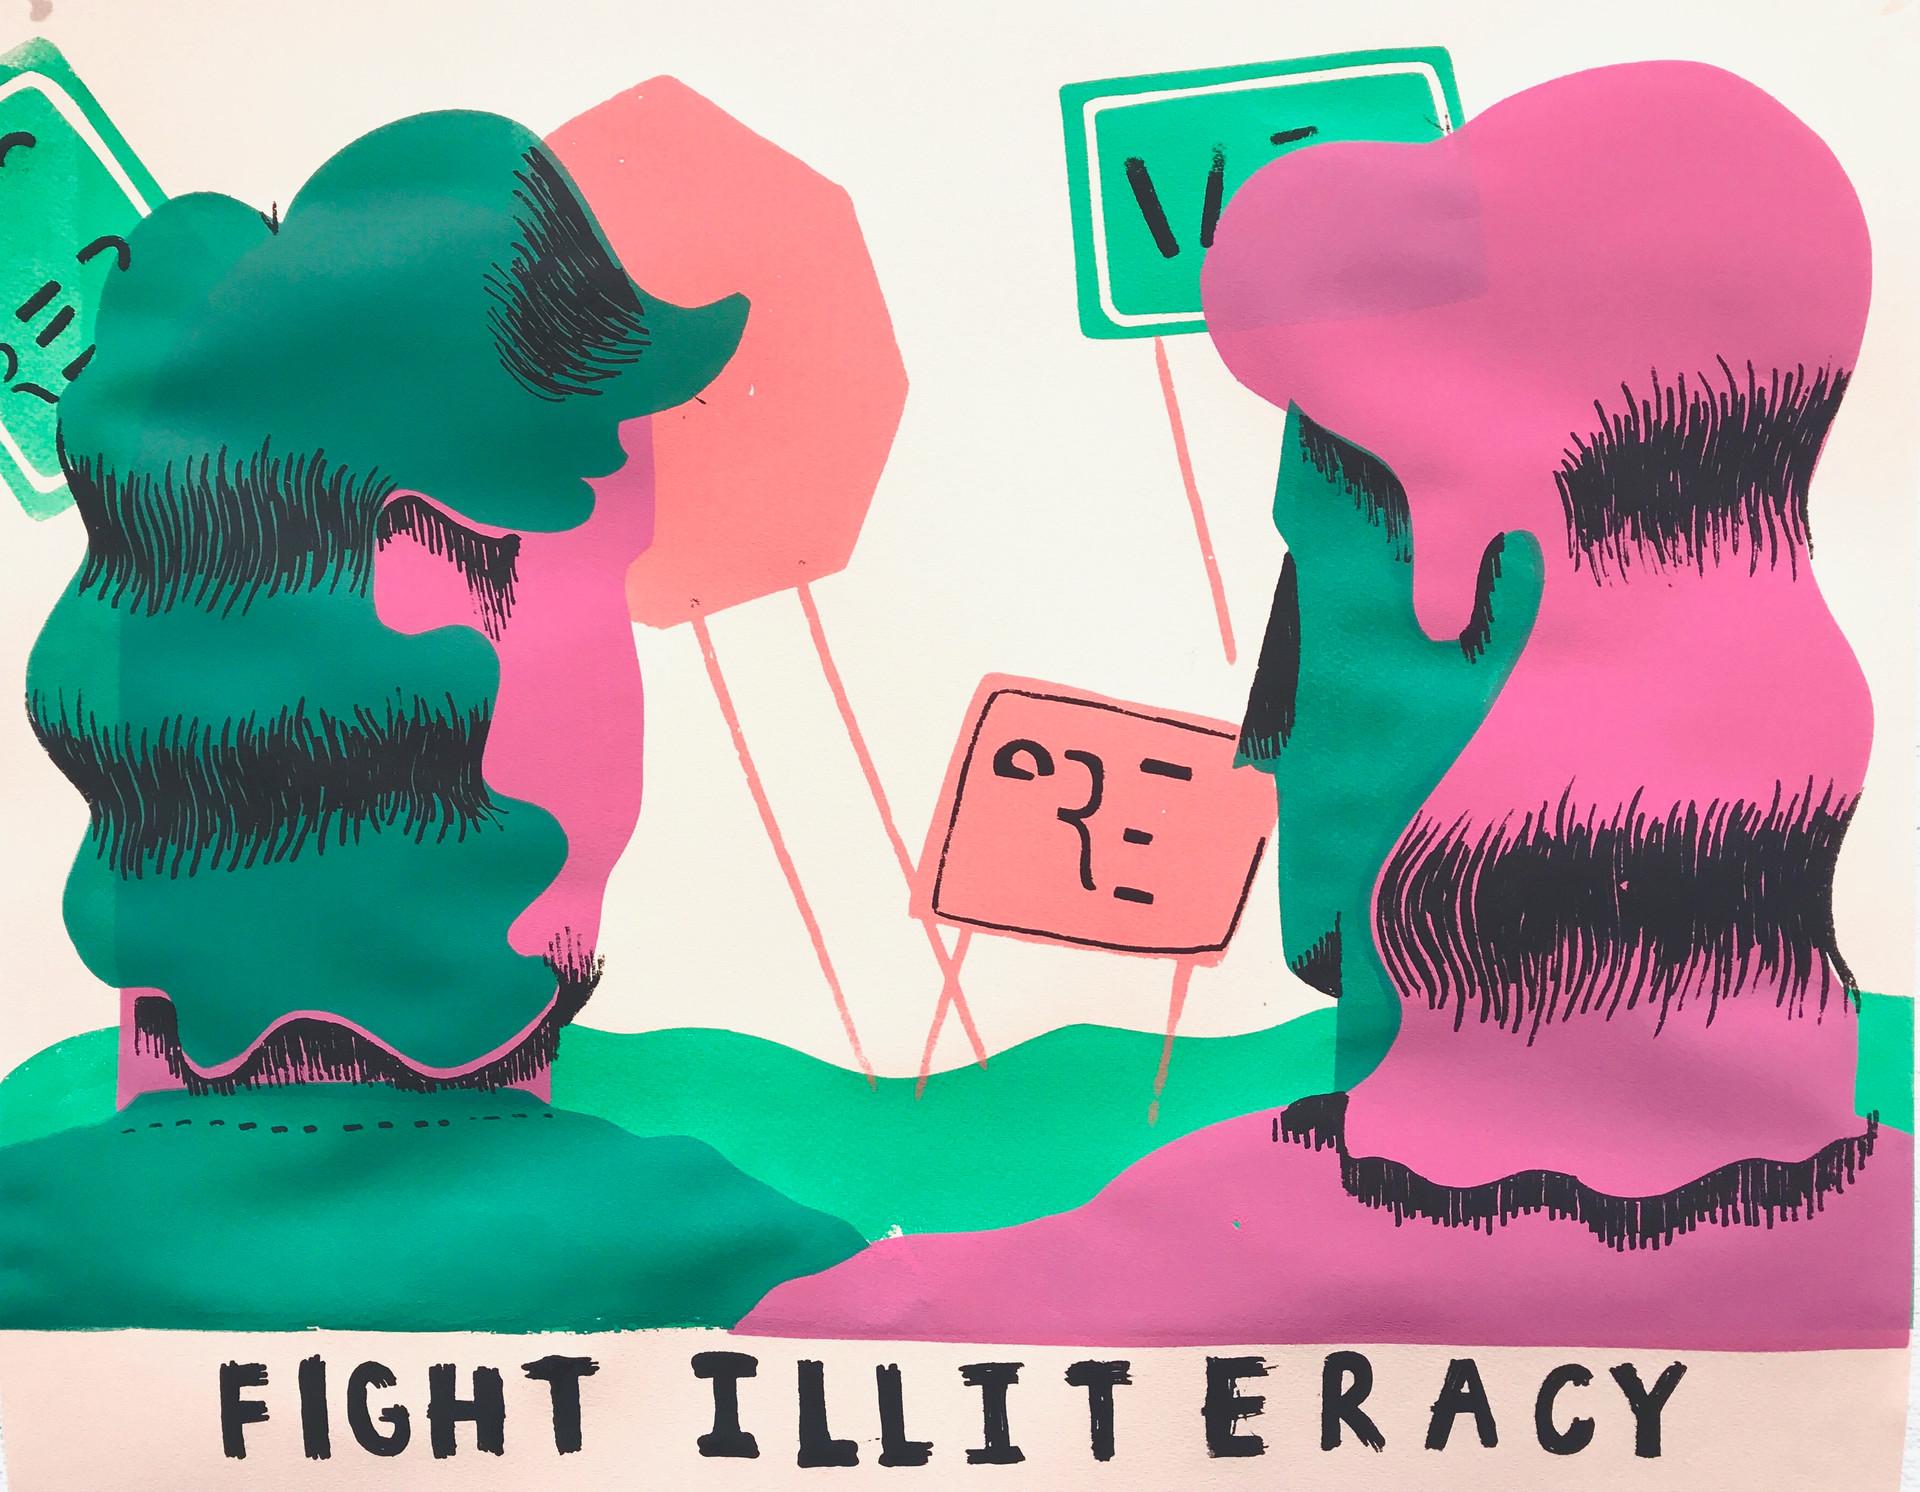 Illiteracy Poster